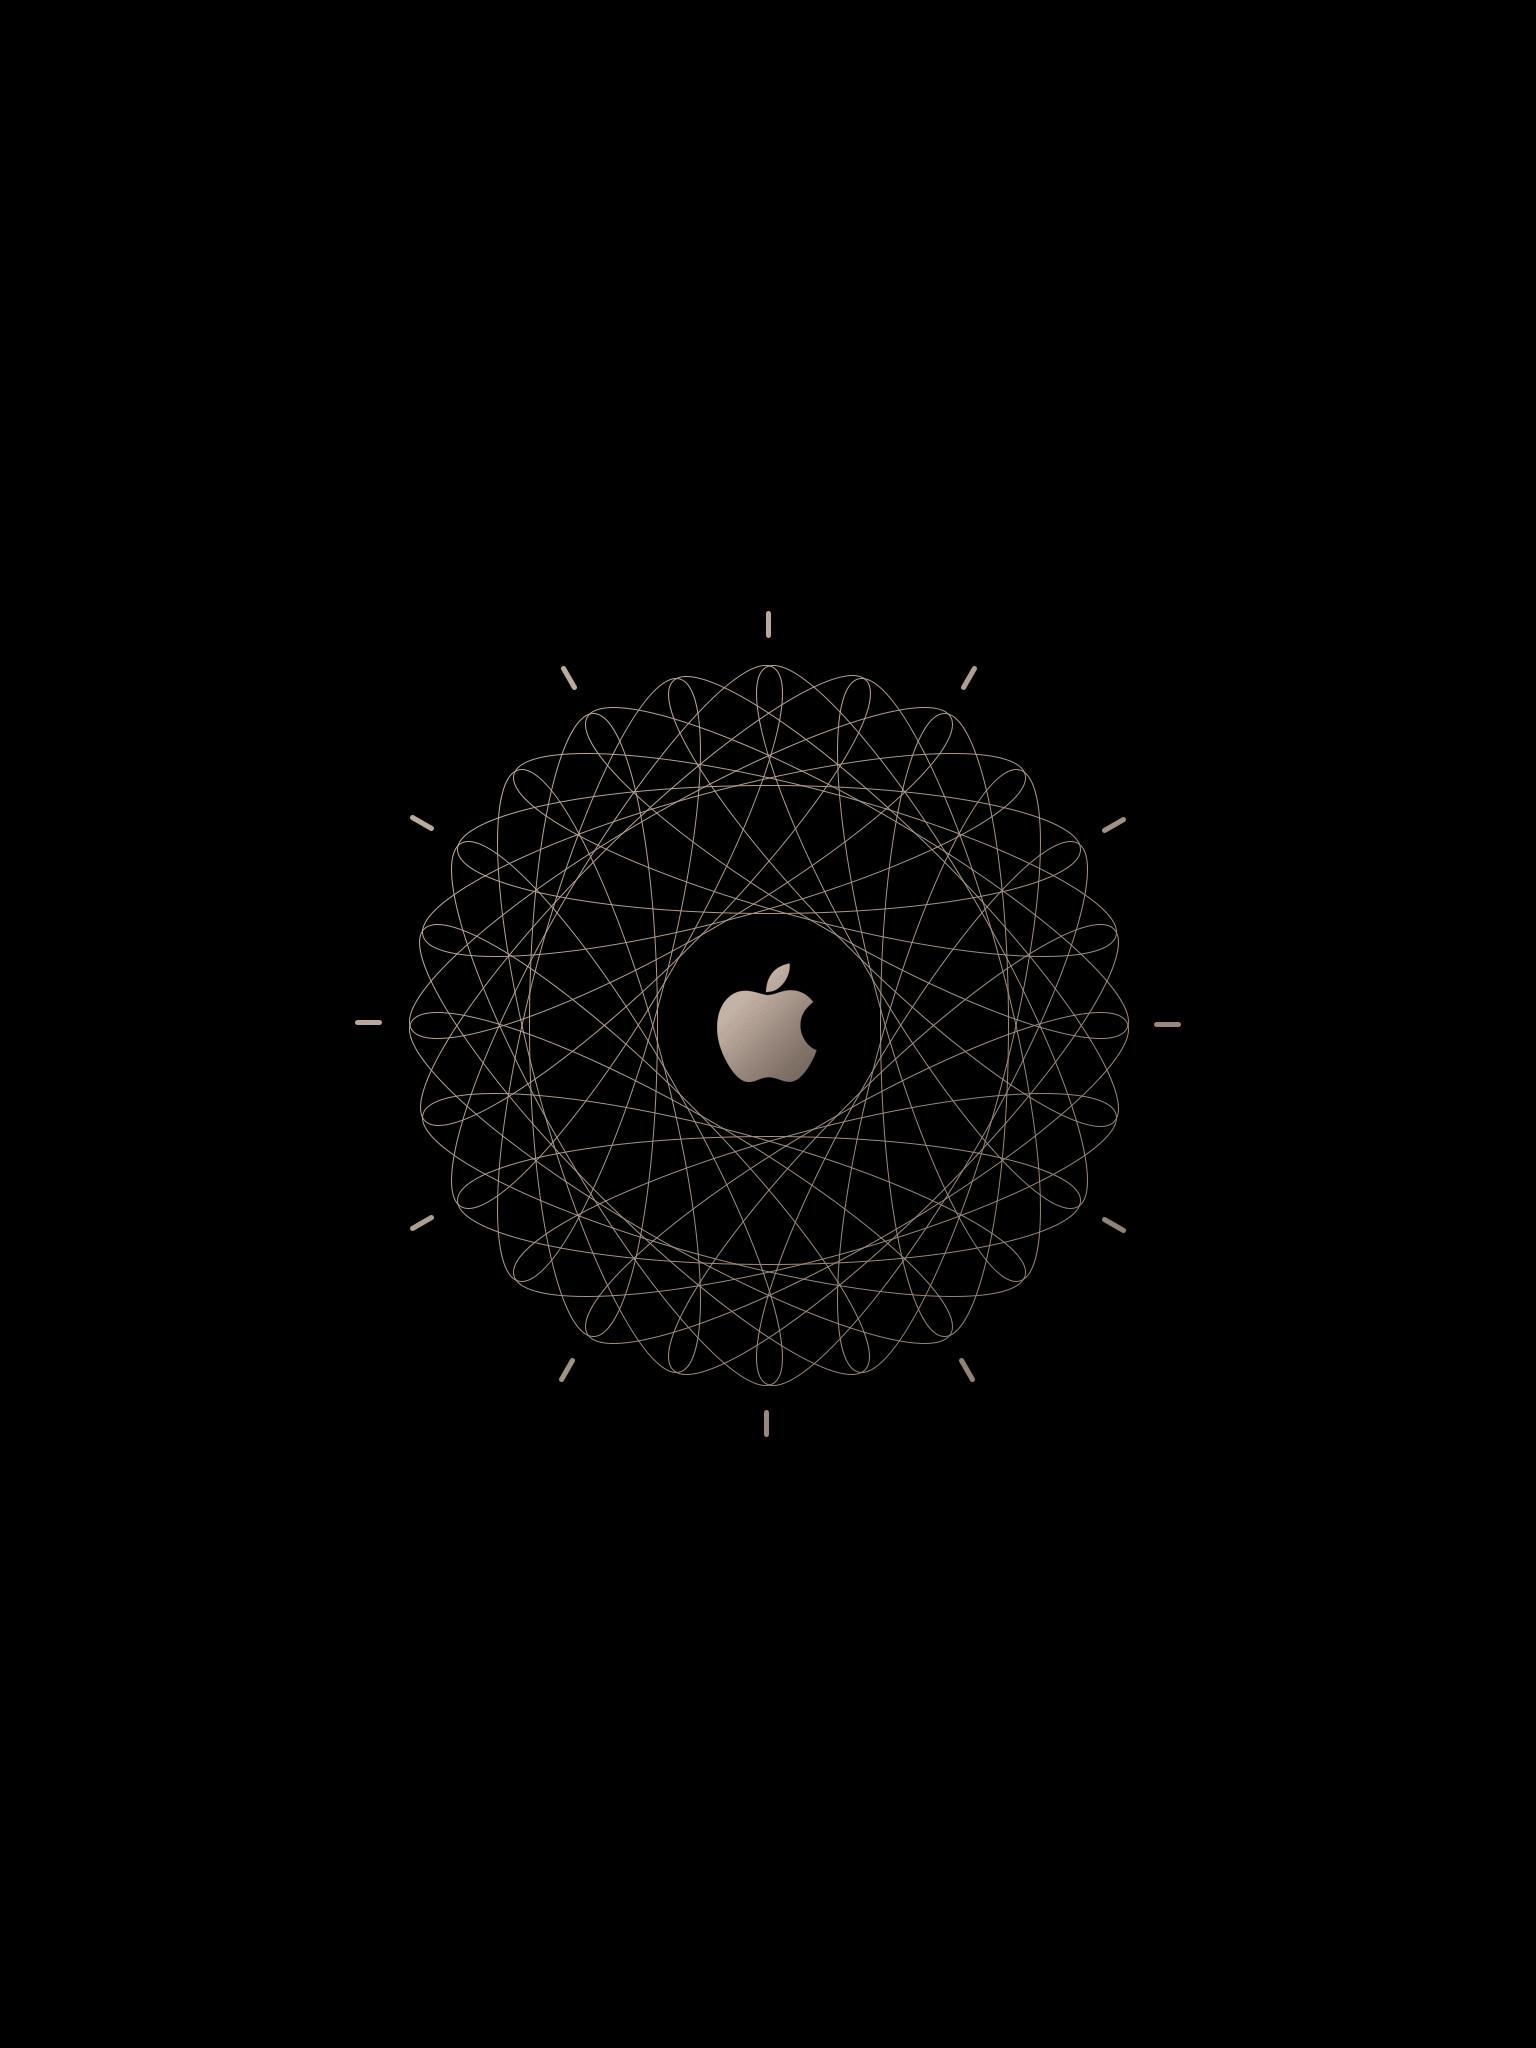 Wallpaper iPad Retina Apple Watch Blanco